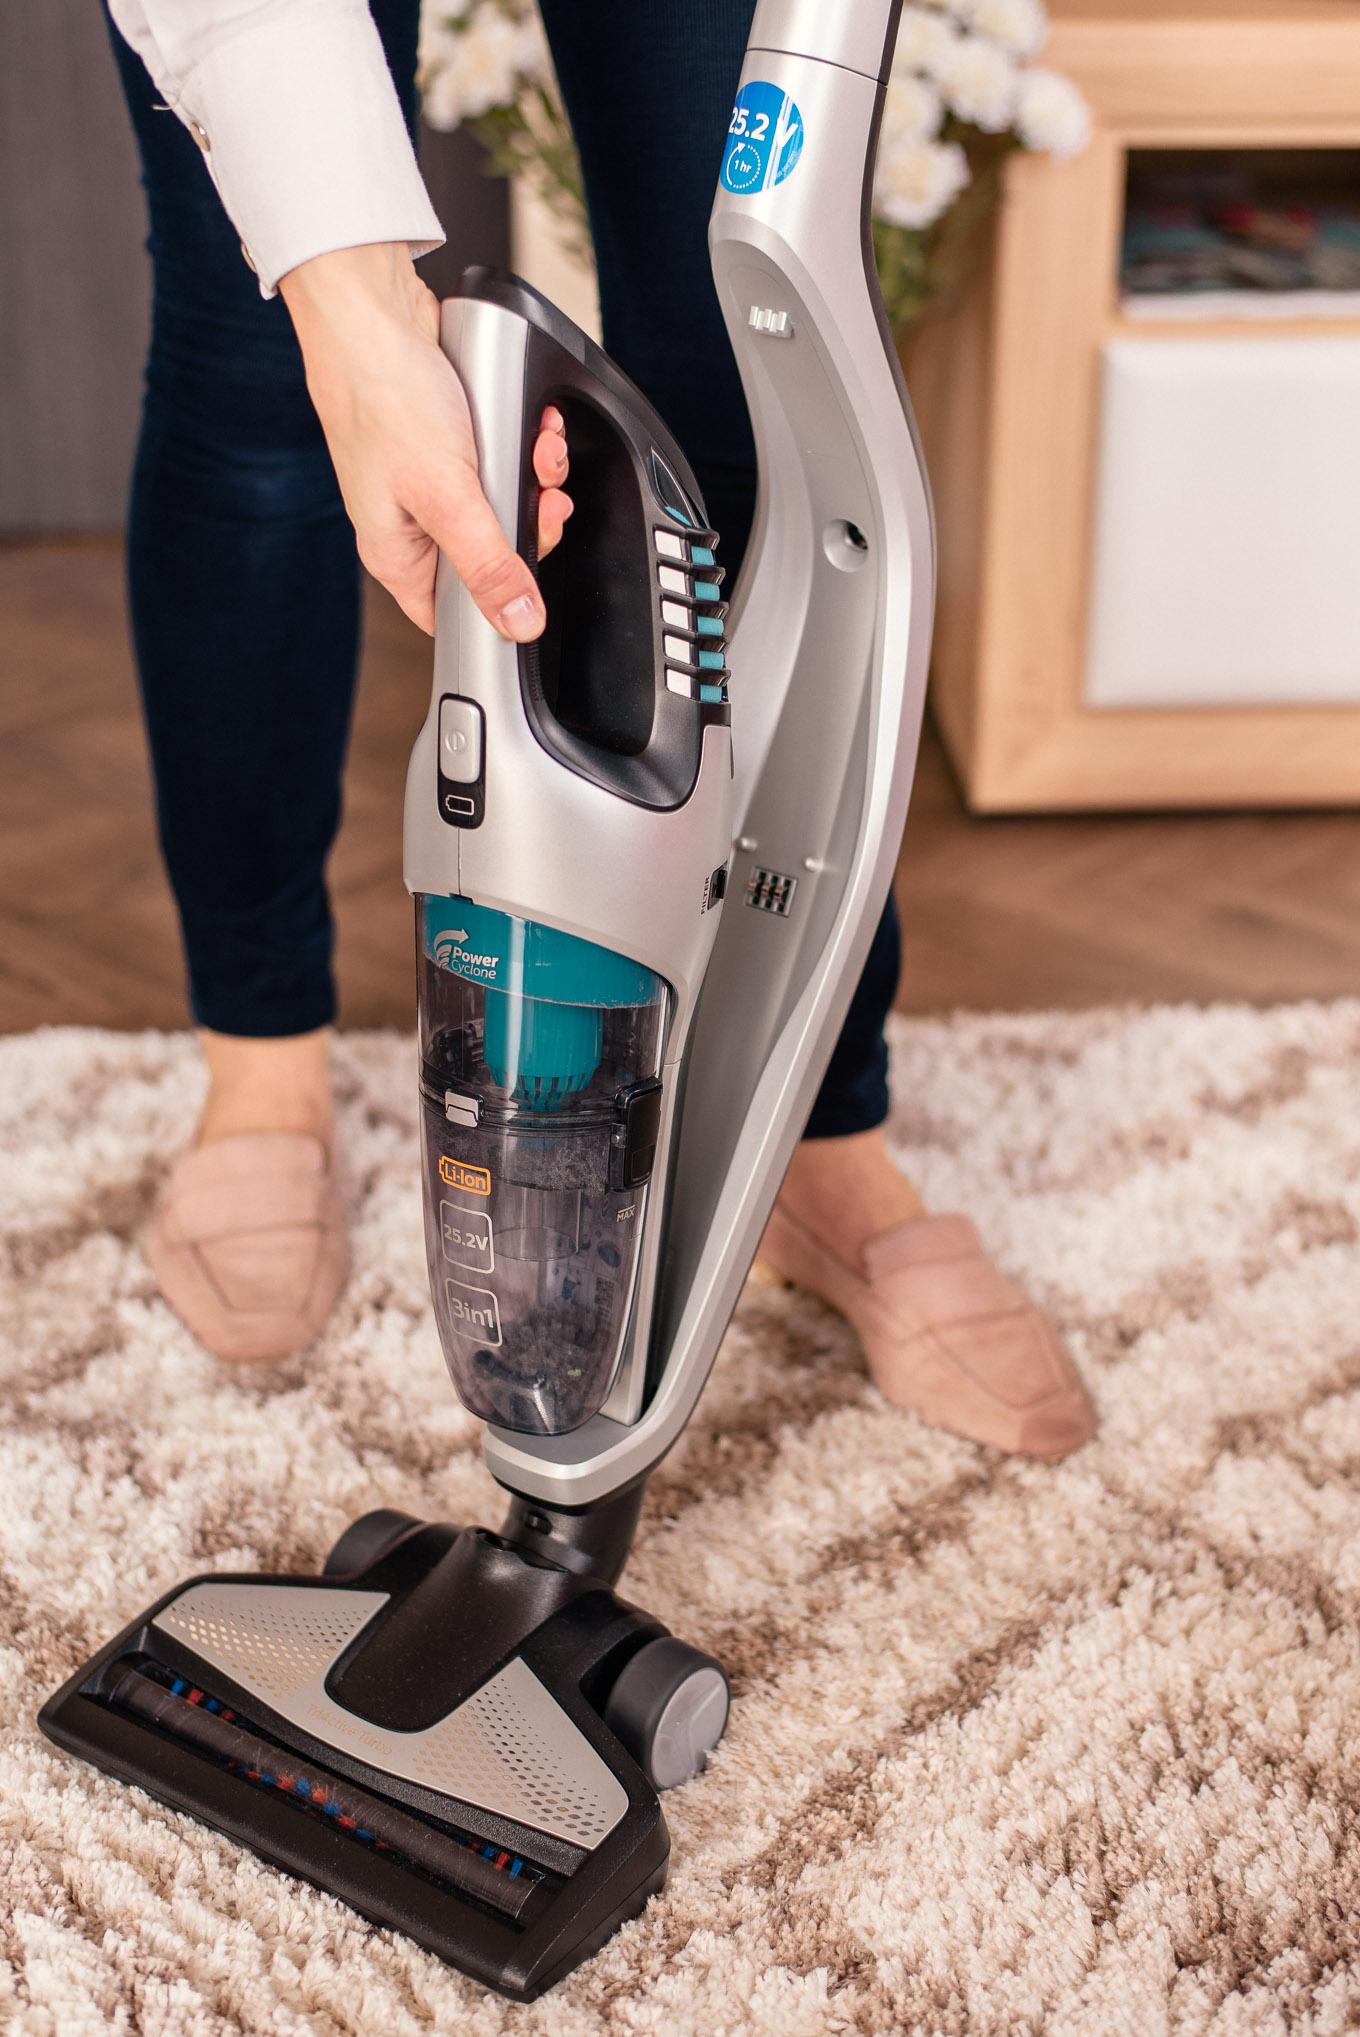 Philips powerpro cleaner